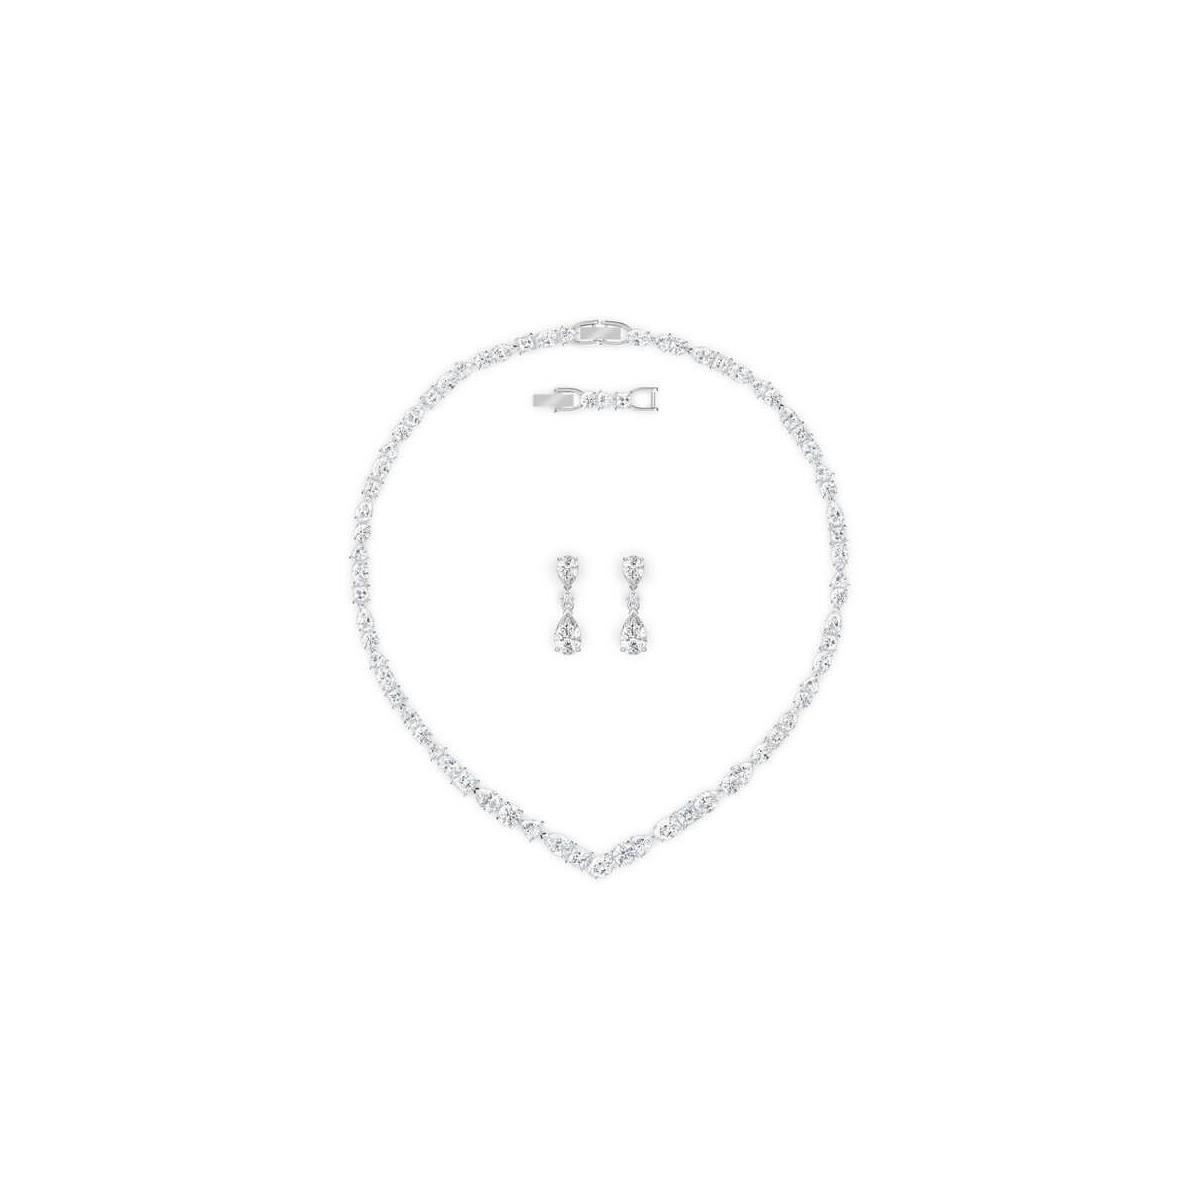 Conjunto Swarovski Tennis Deluxe Novia 5575495